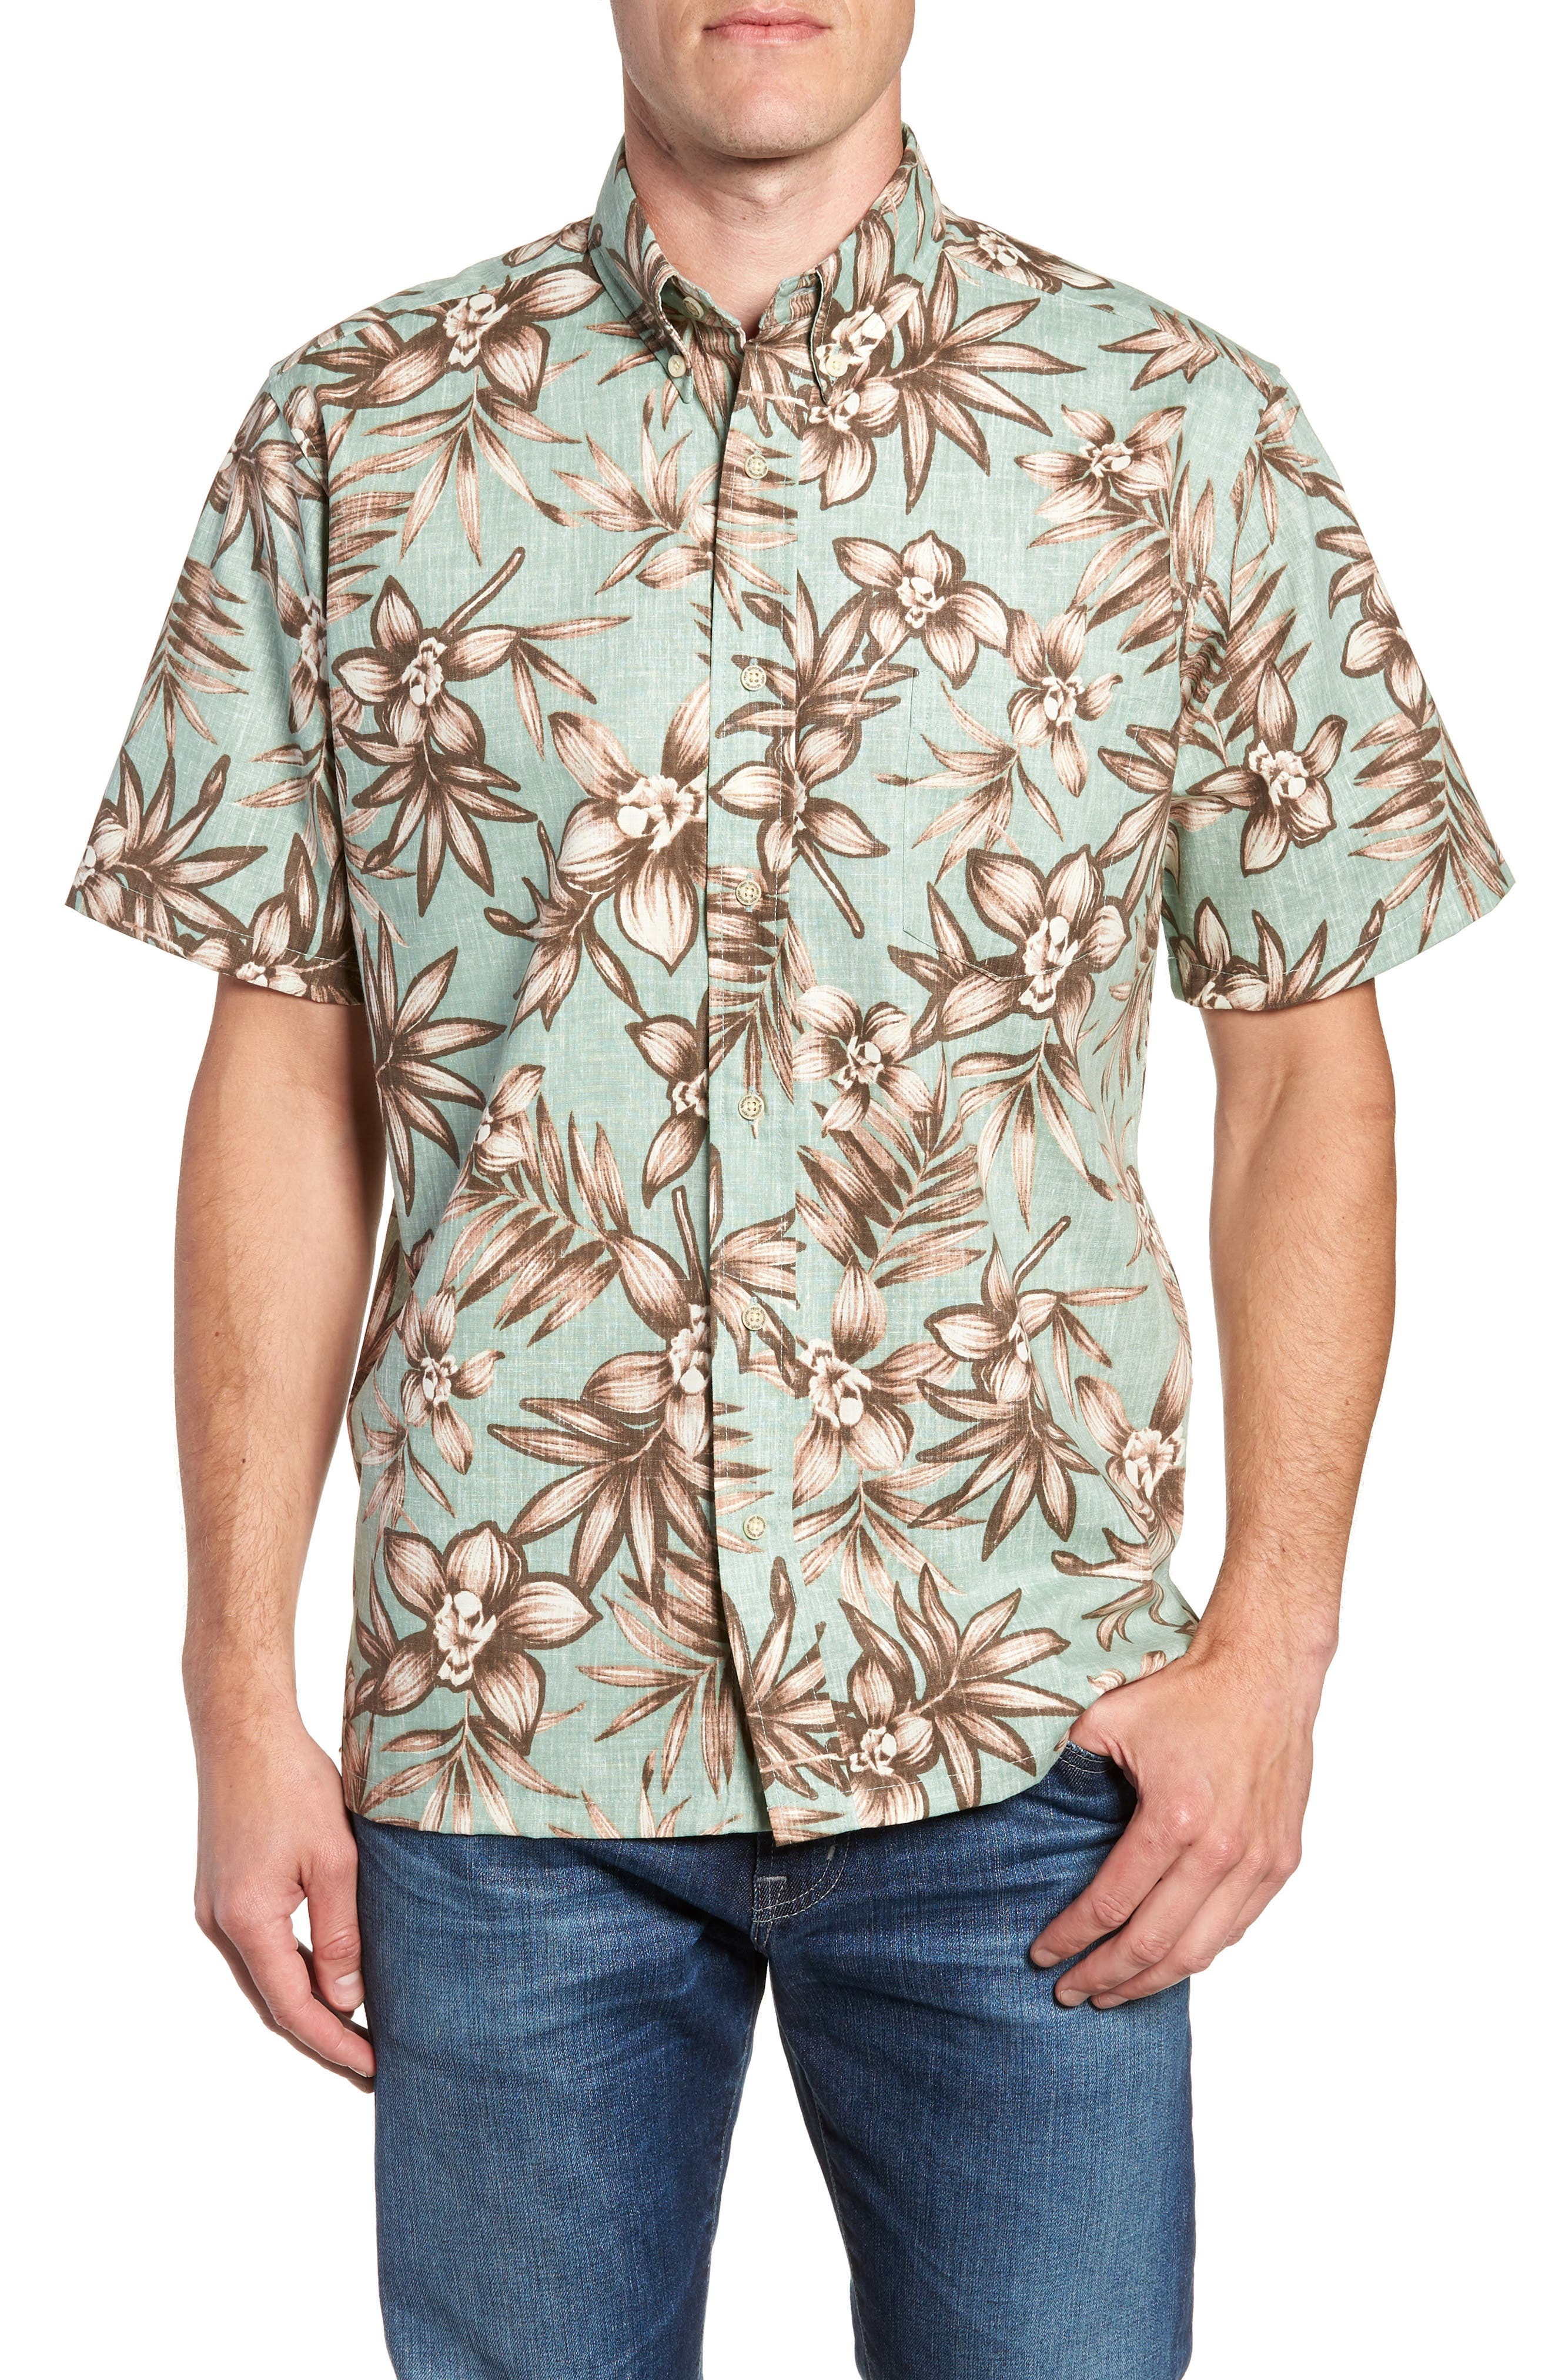 Onishi Garden Regular Fit Sport Shirt,                             Main thumbnail 1, color,                             Seafoam